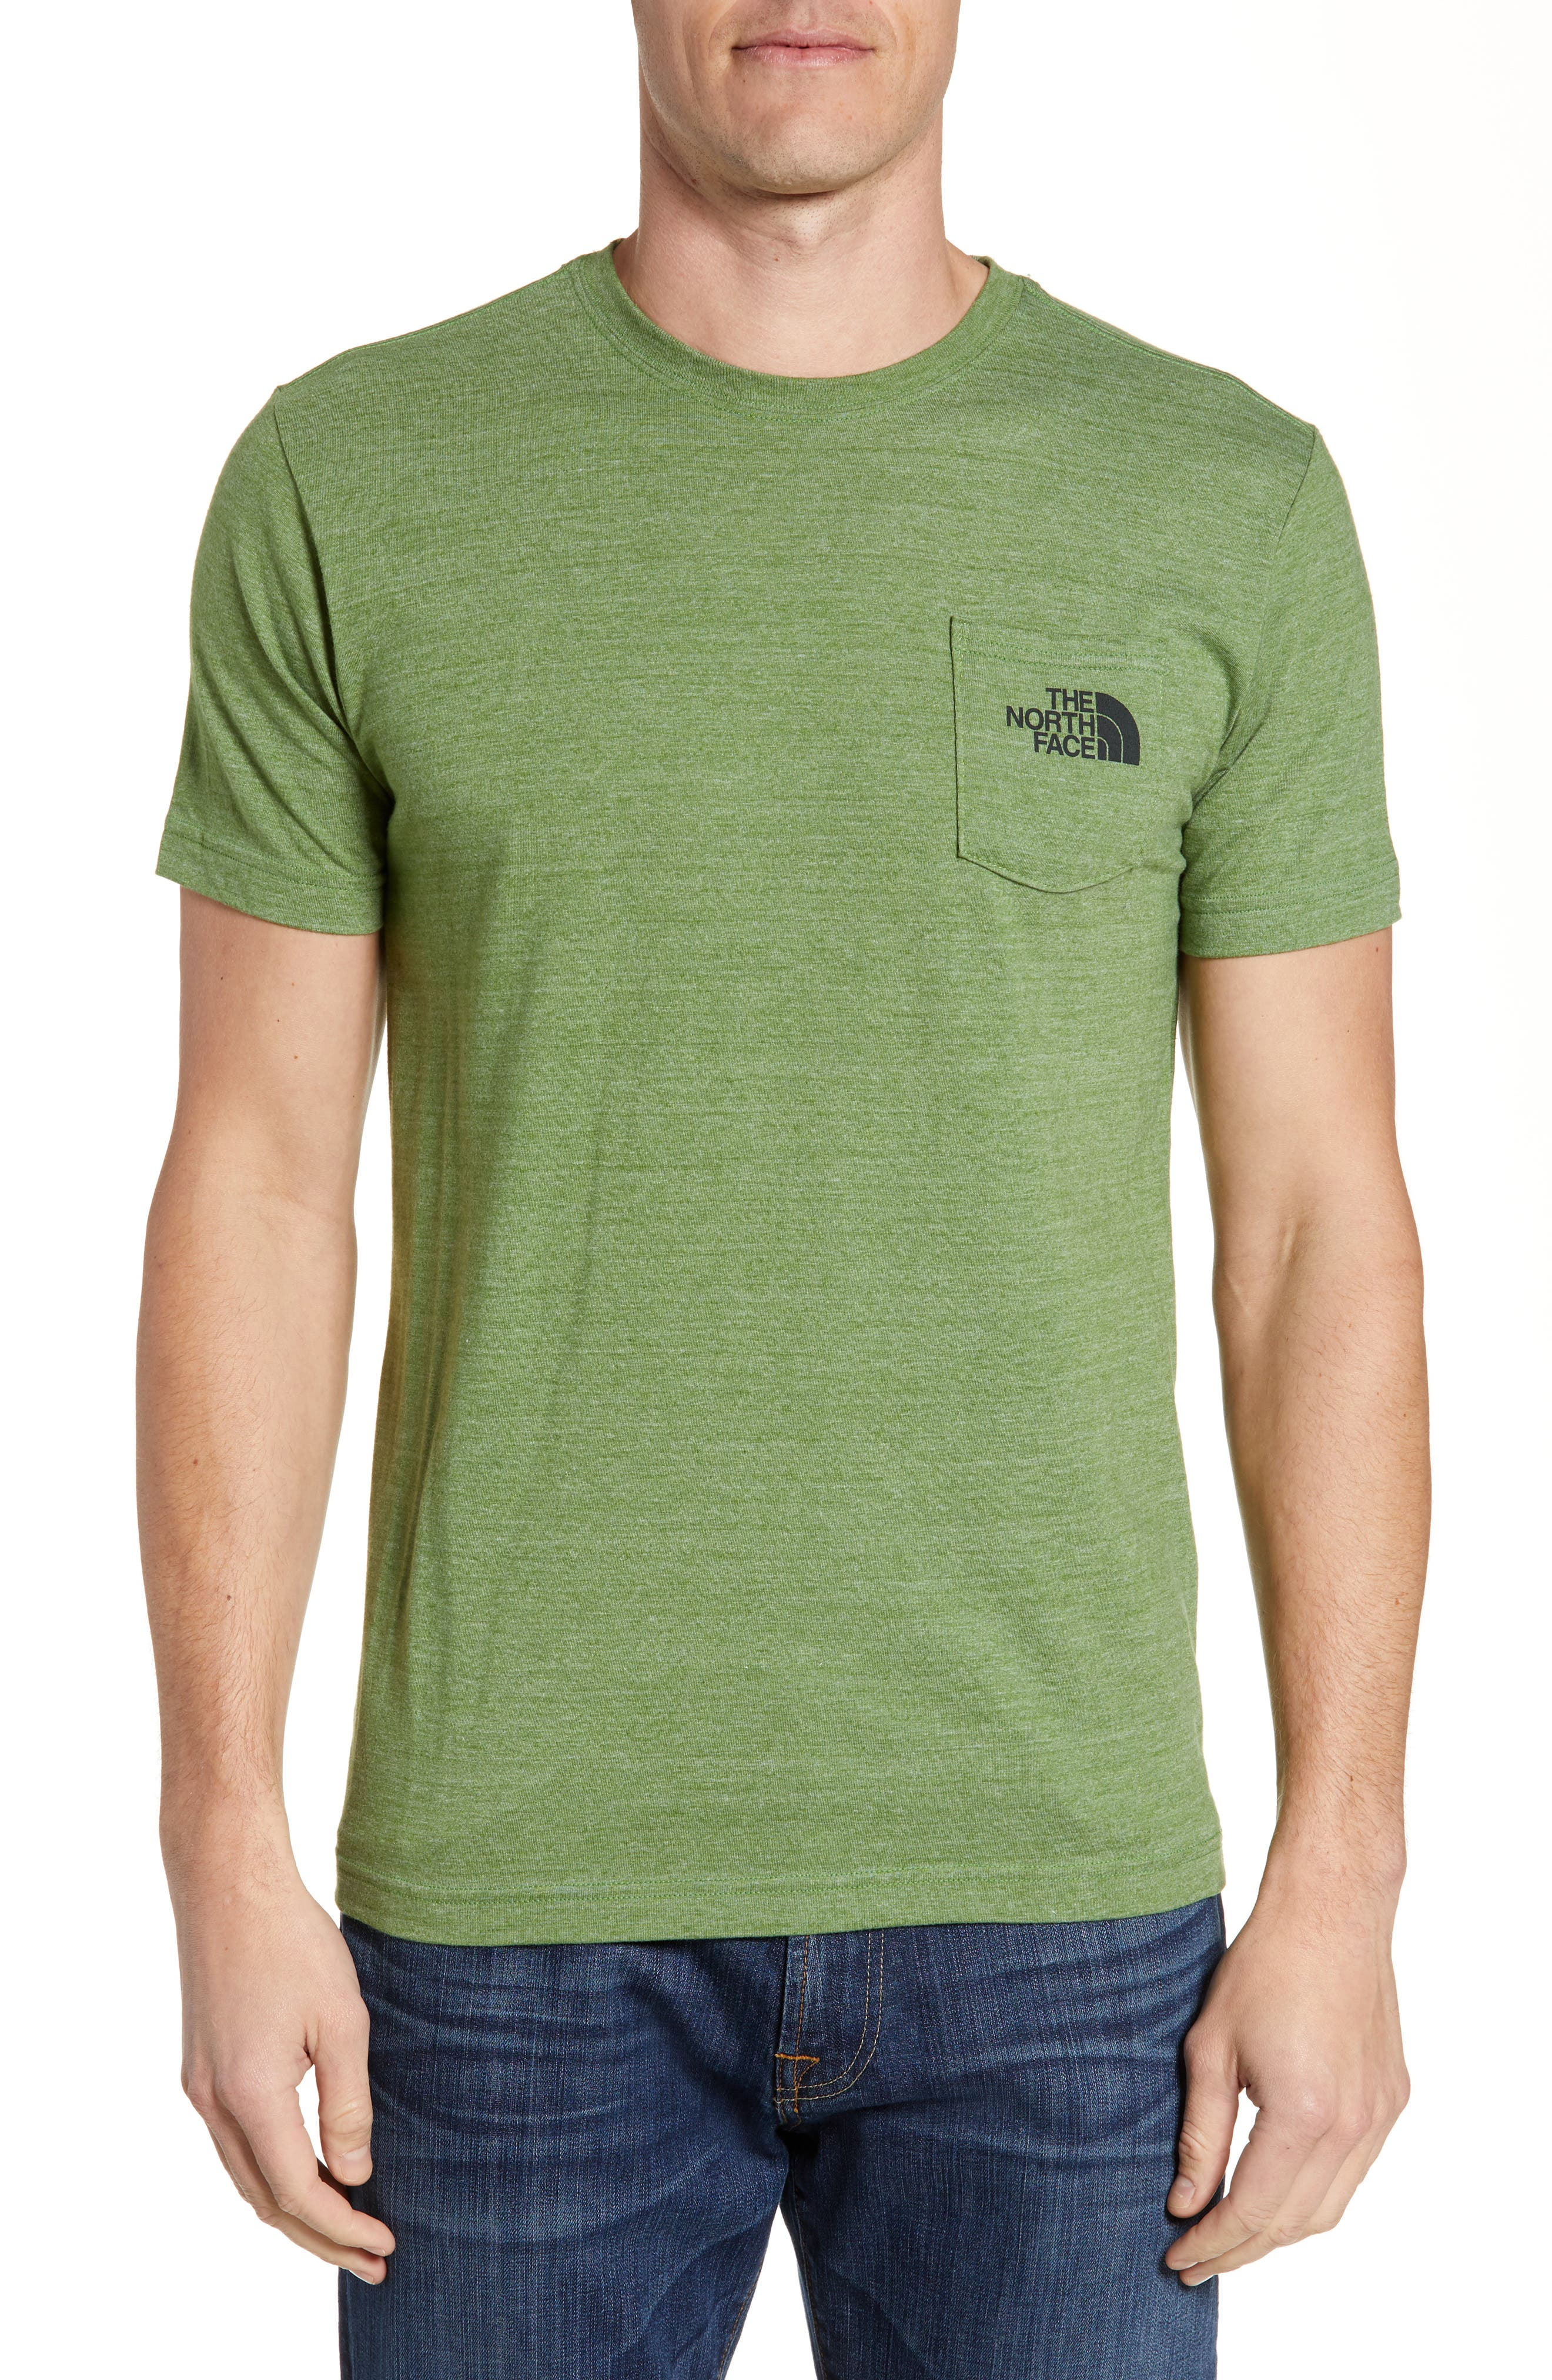 The North Face Gradient Desert T-Shirt